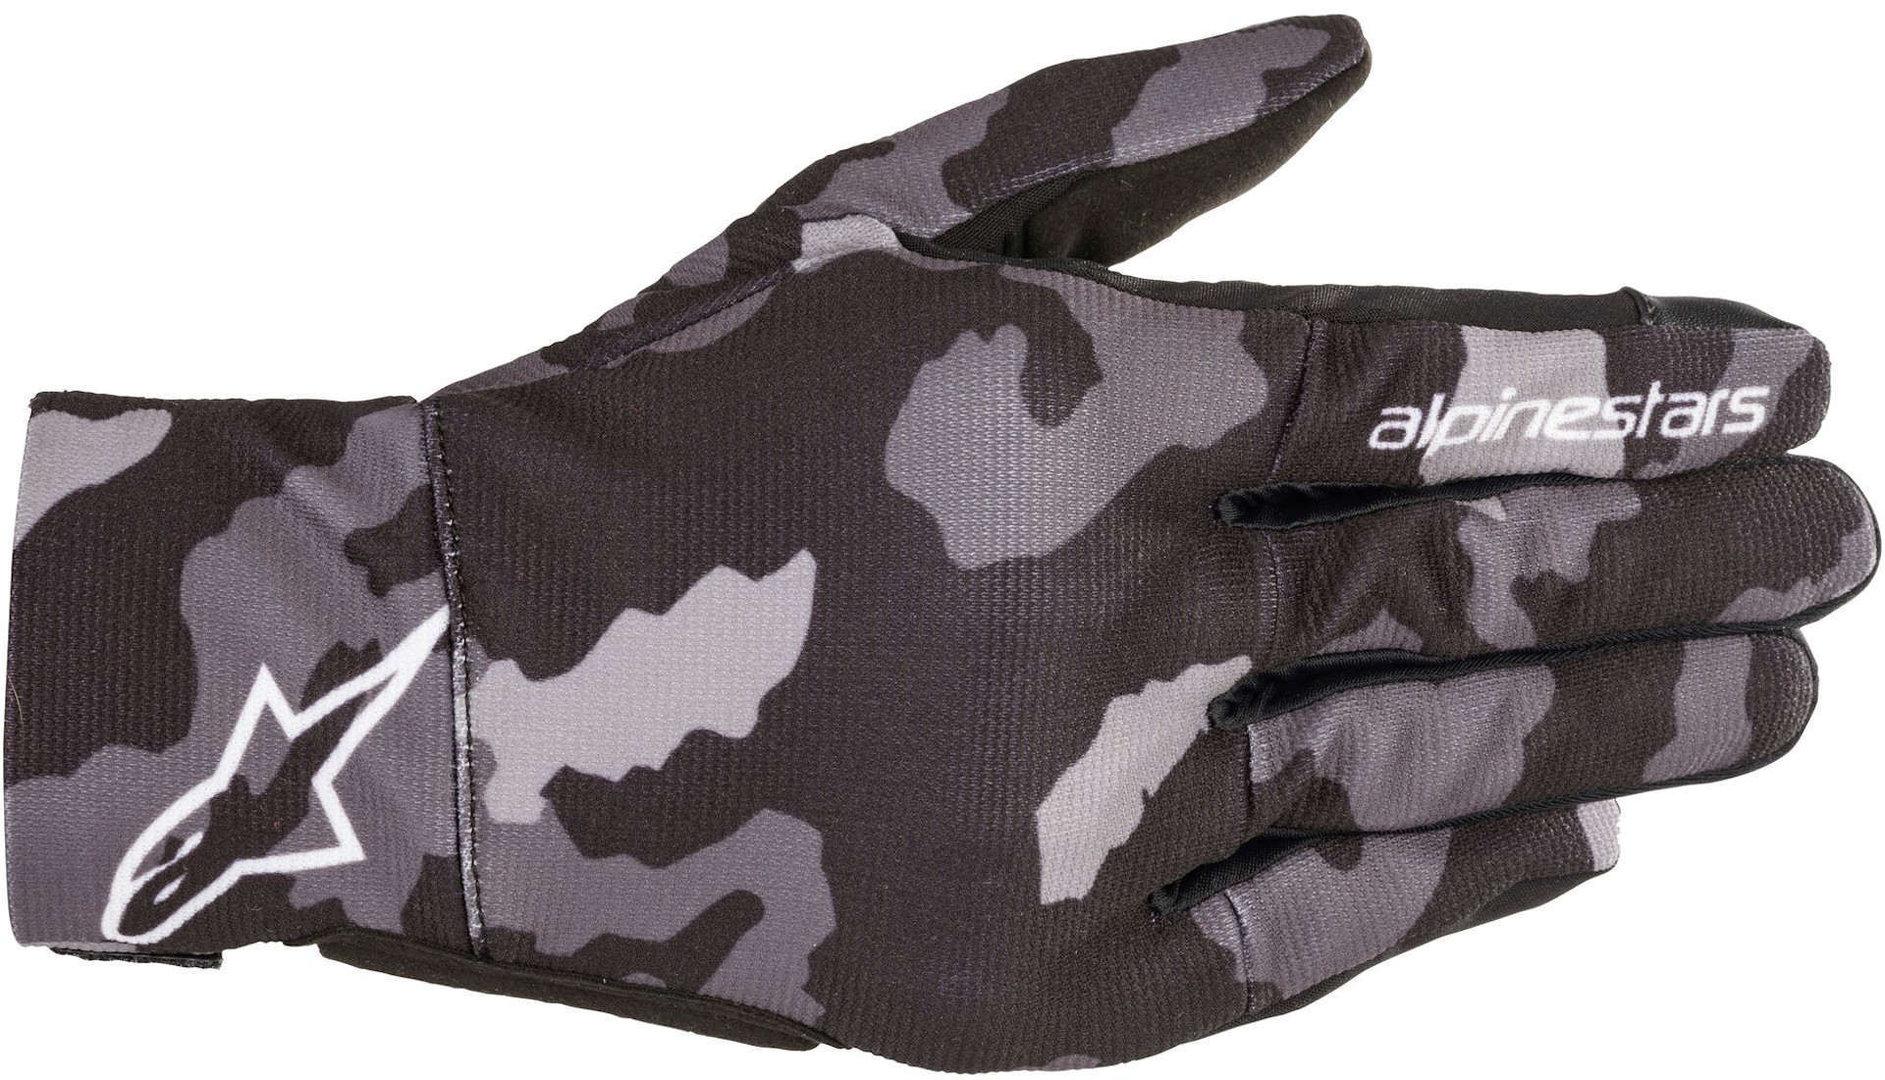 Alpinestars Reef Motorcycle Gloves Image